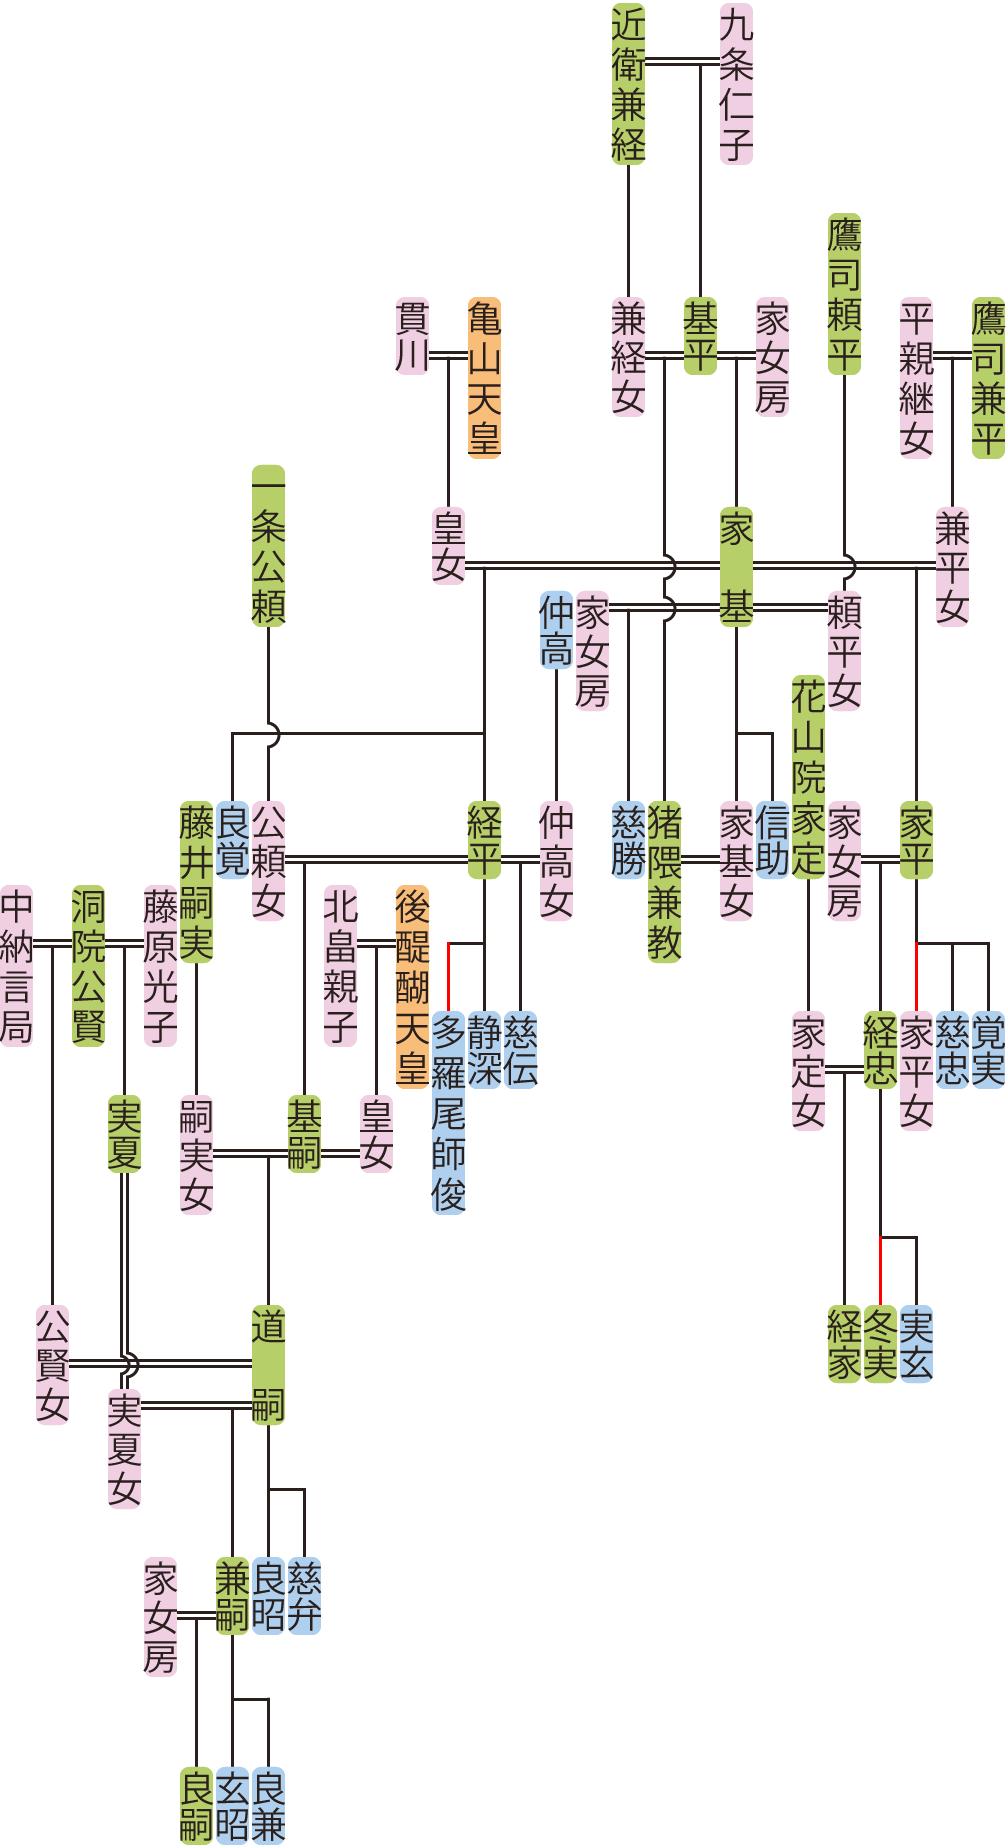 近衛家基~道嗣の系図